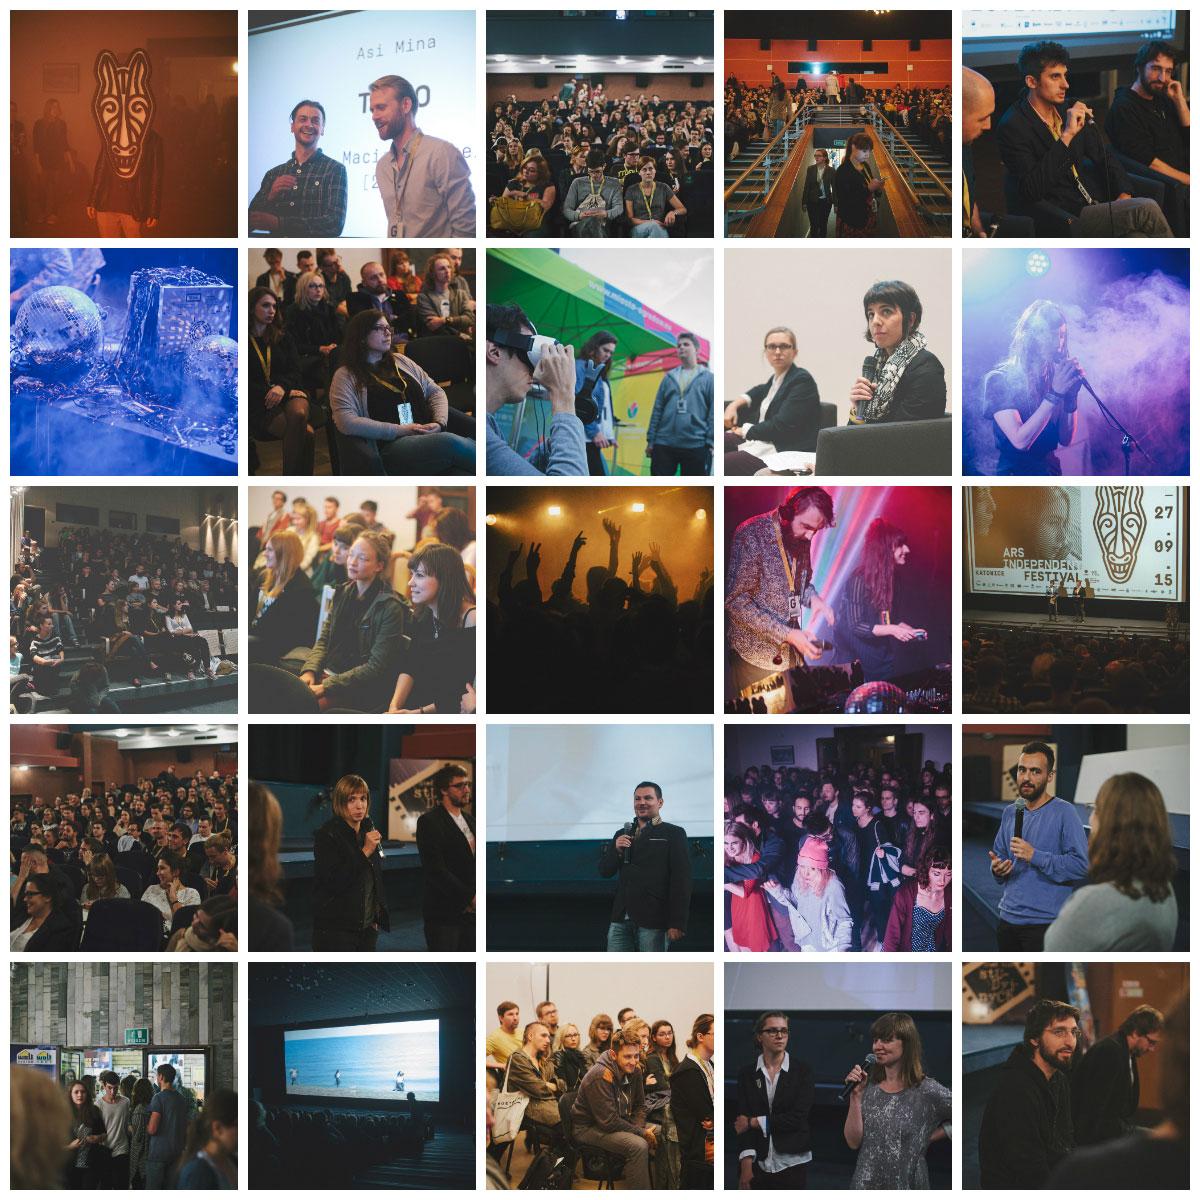 Ars Independent Festival 2015, kolaż (źródło: materiały prasowe organizatora)